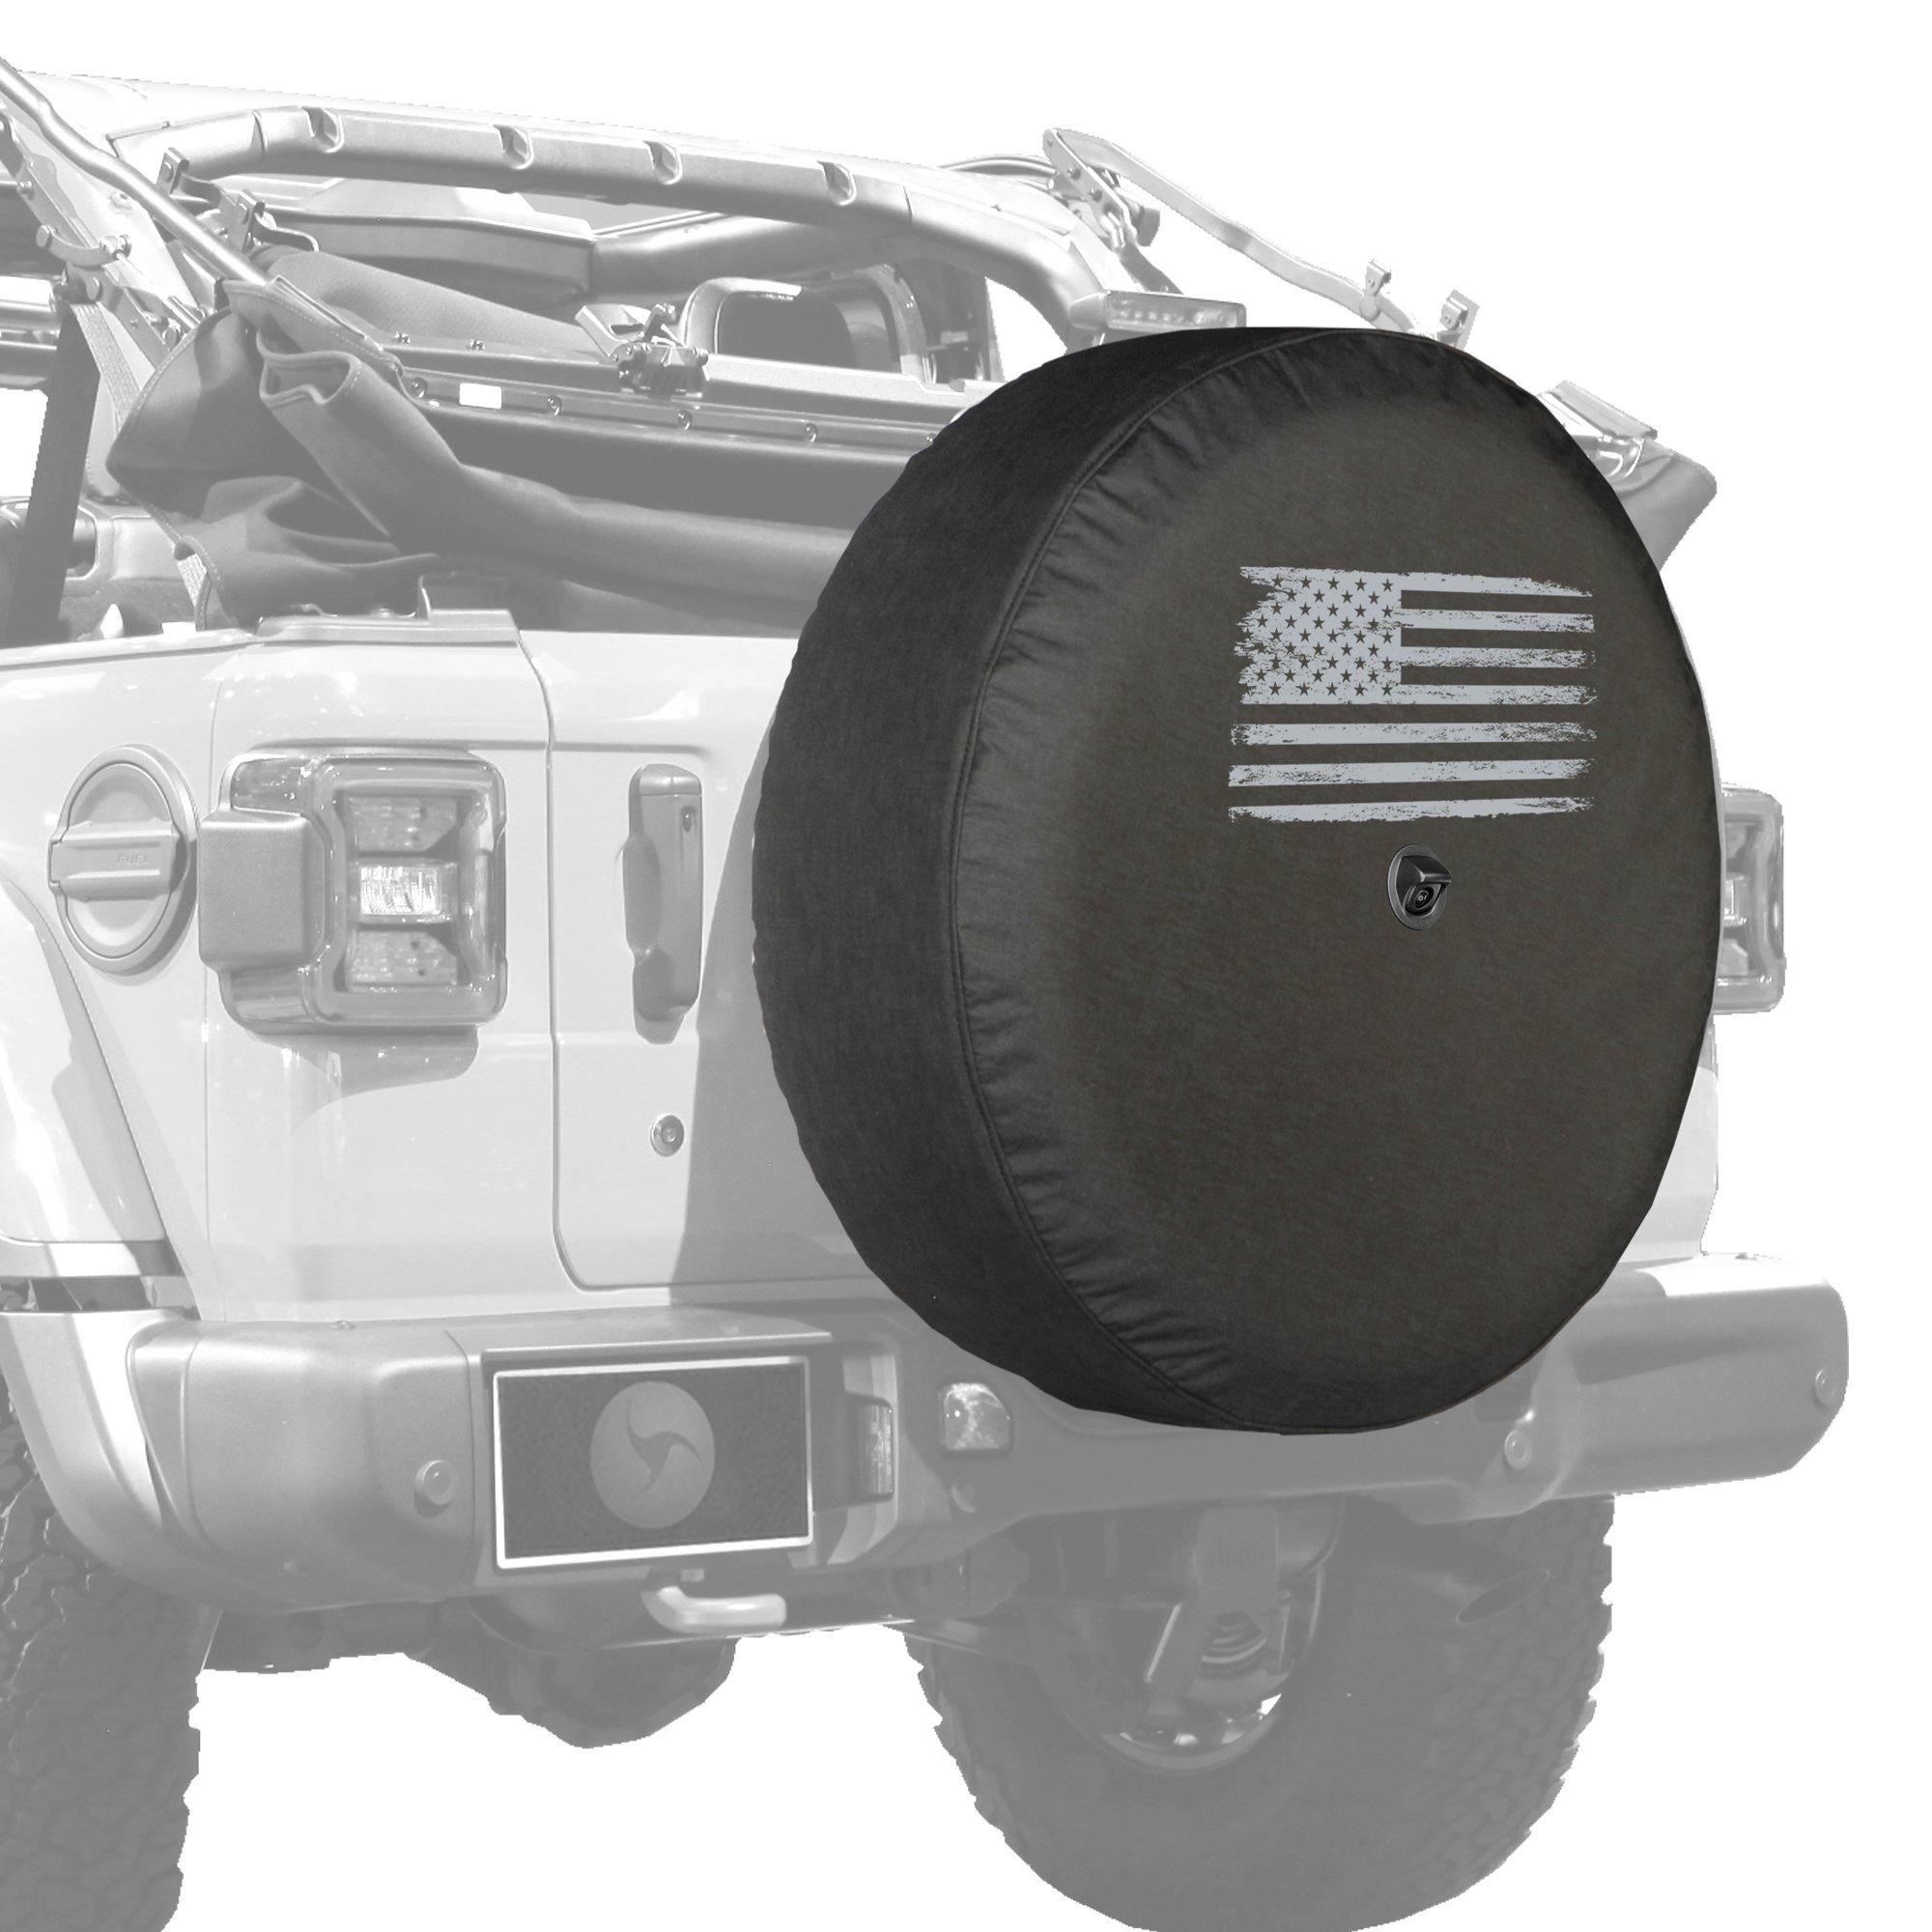 2018 Jeep Wrangler Rubicon JL & JLU - 33'' Soft Tire Cover - Distressed American Flag